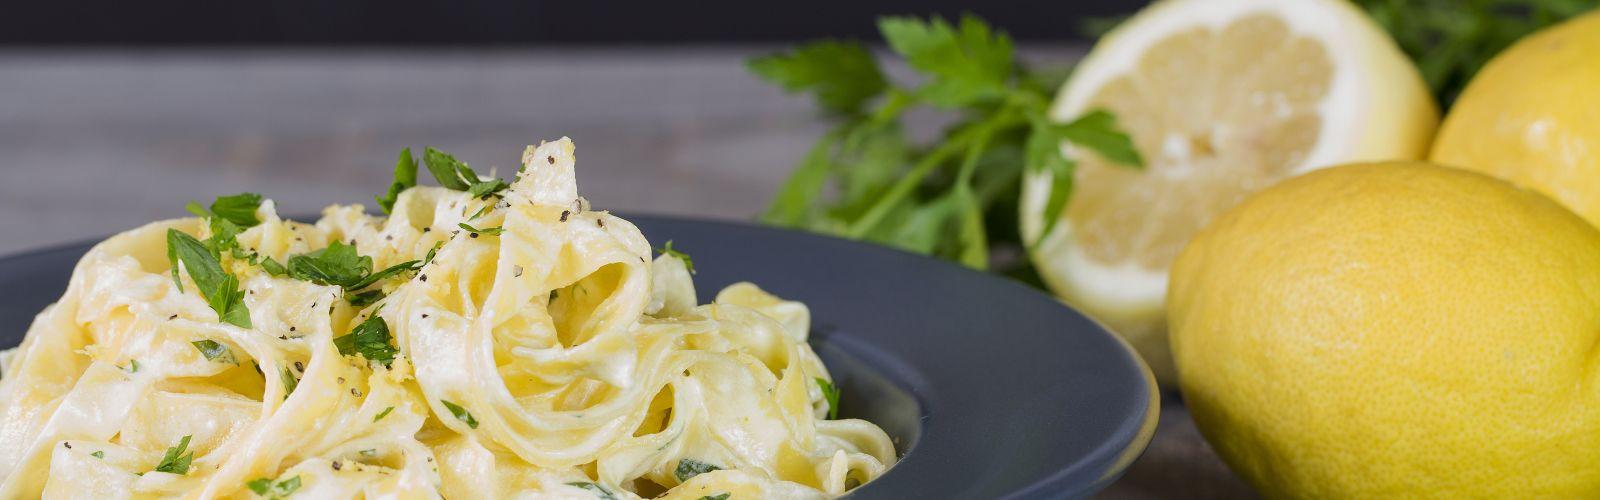 a bowl of lemon herb pasta